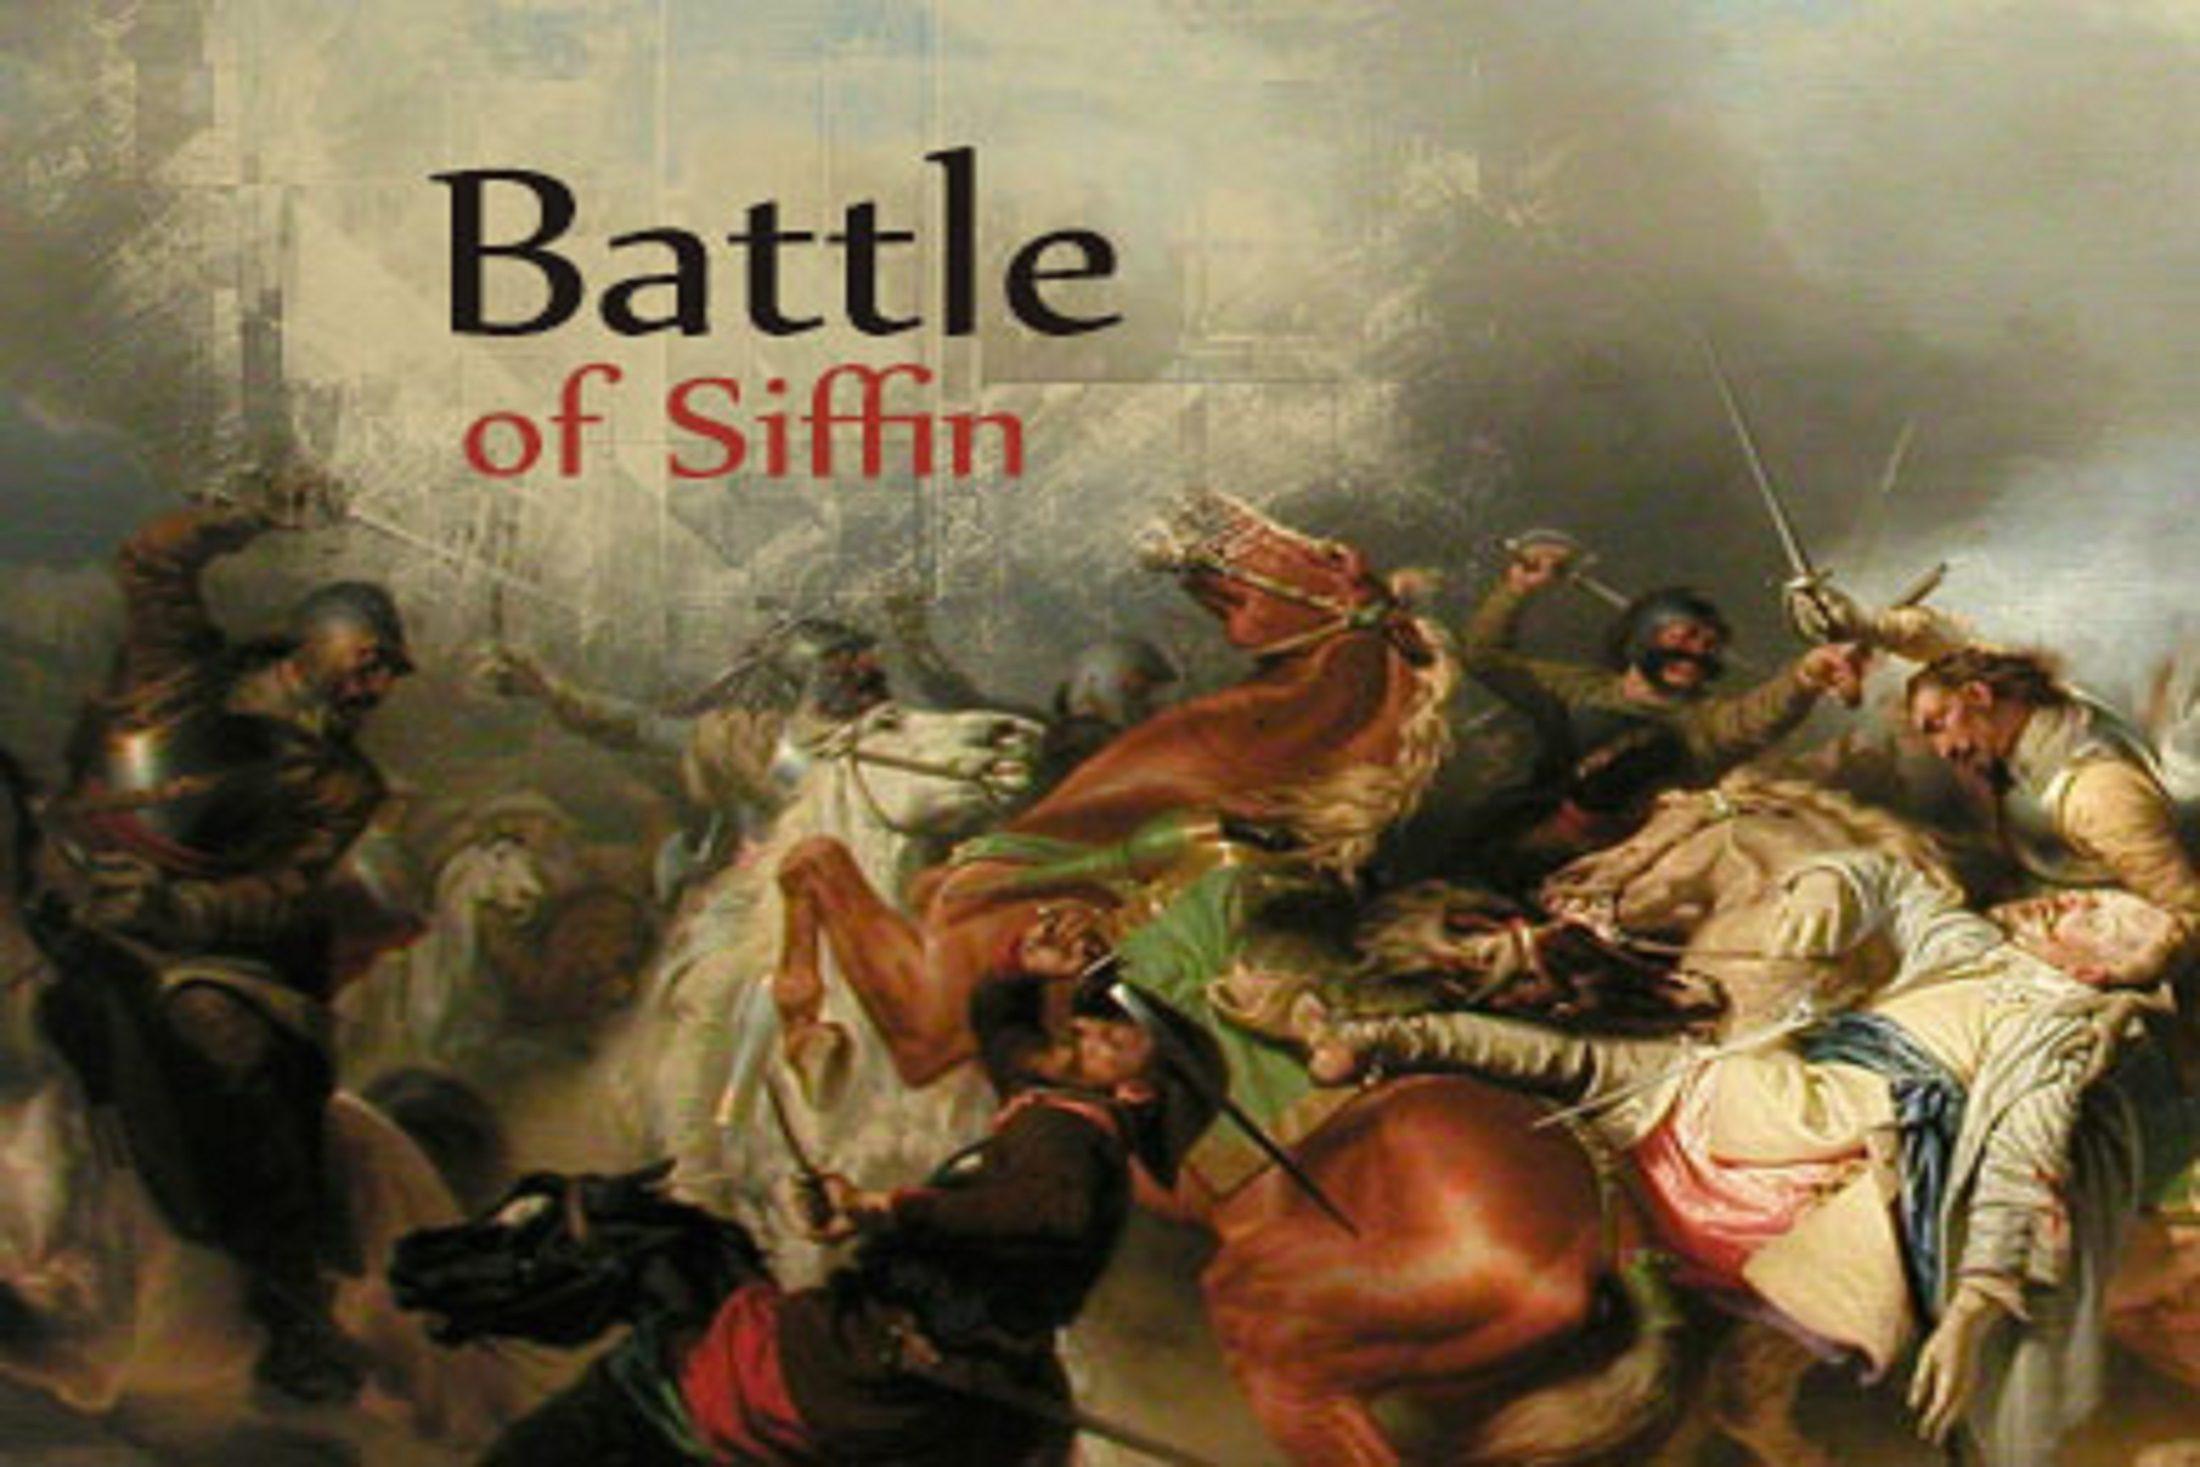 Debate on Ameerul Momineen Ali Ibn Abi Talib's (a.s.) rightfulness in Jamal and Siffeen